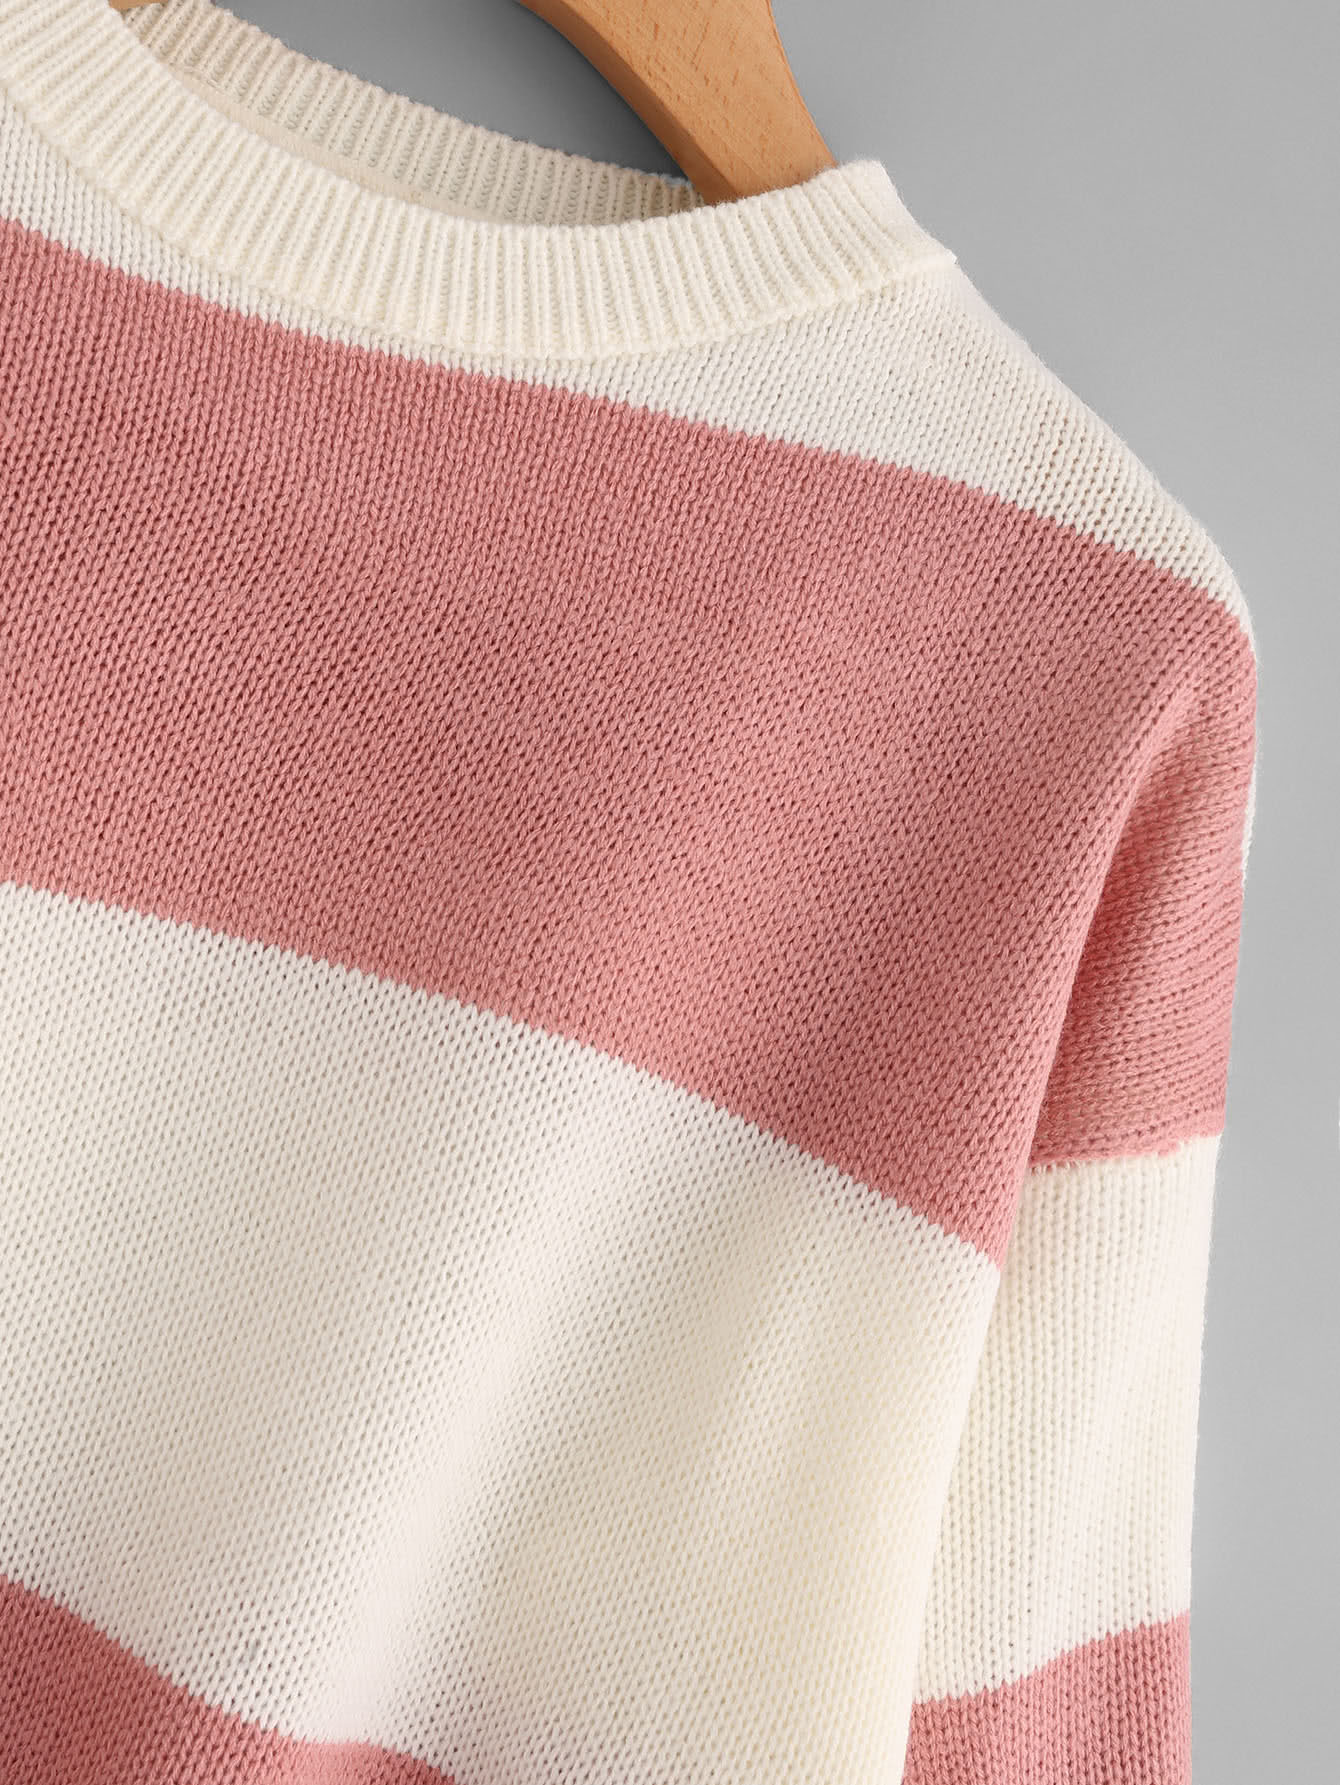 Wide Striped Sweater